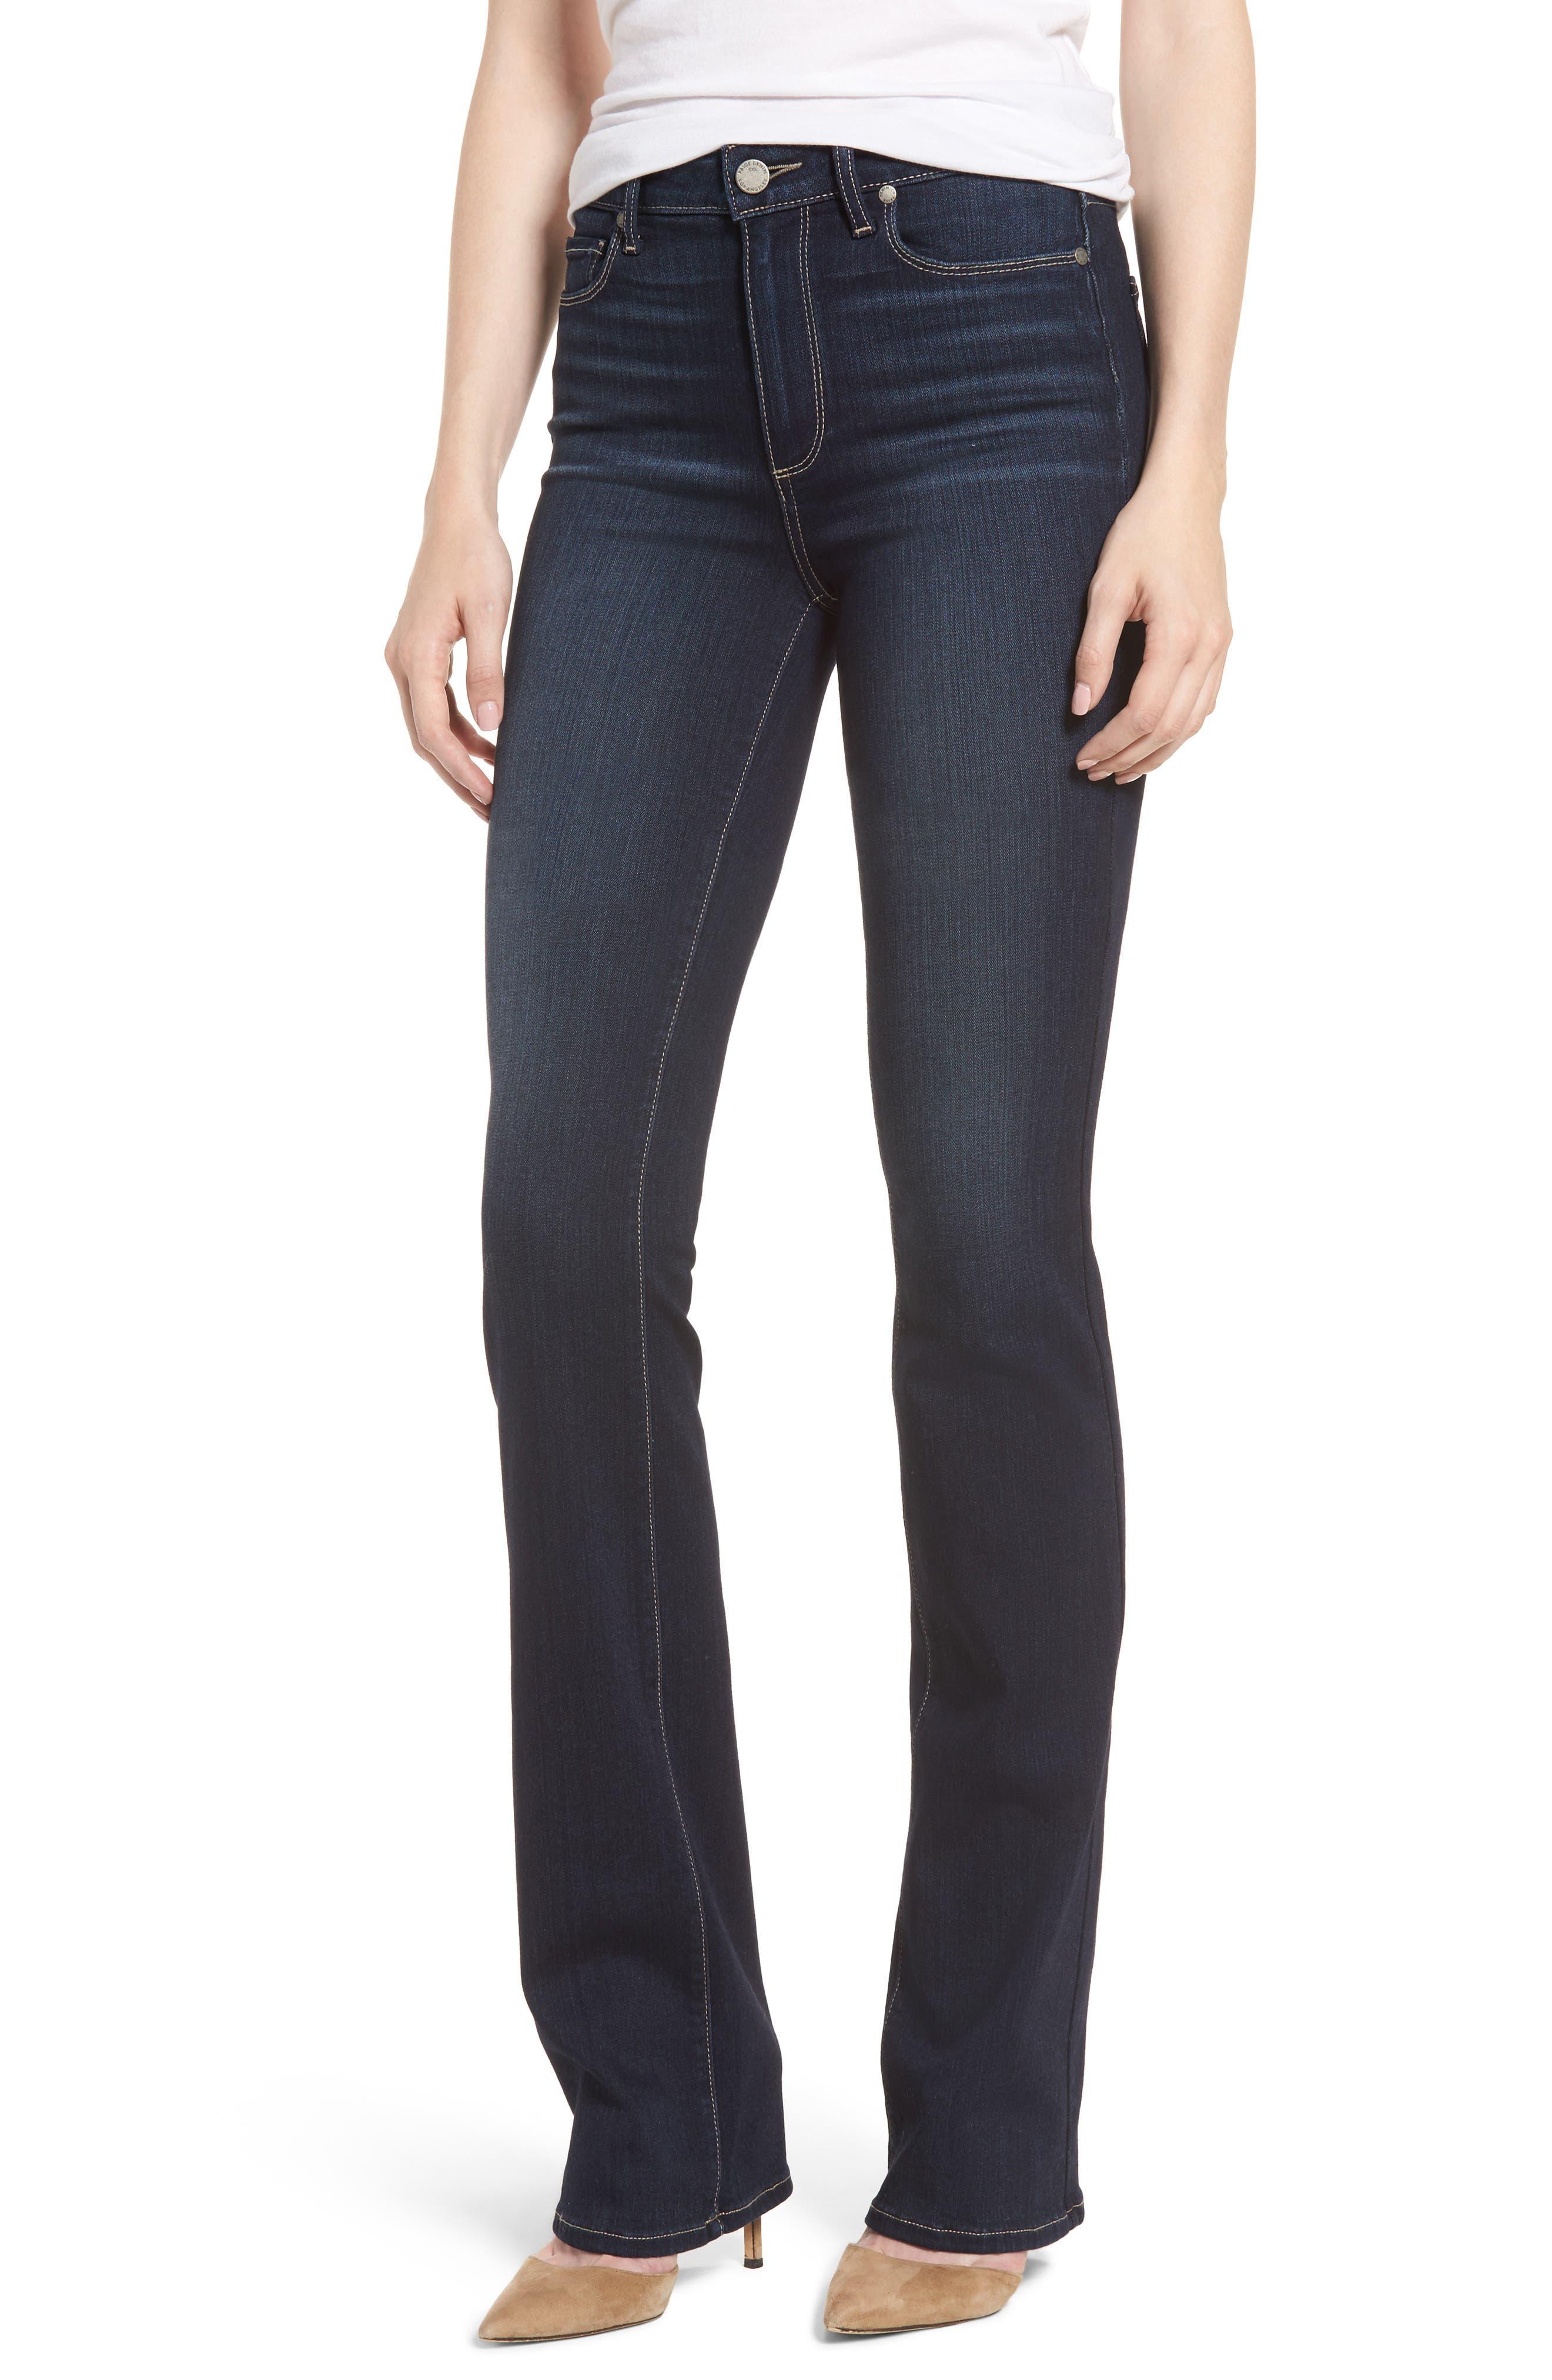 PAIGE Transcend - Manhattan High Waist Bootcut Jeans (Gardena)